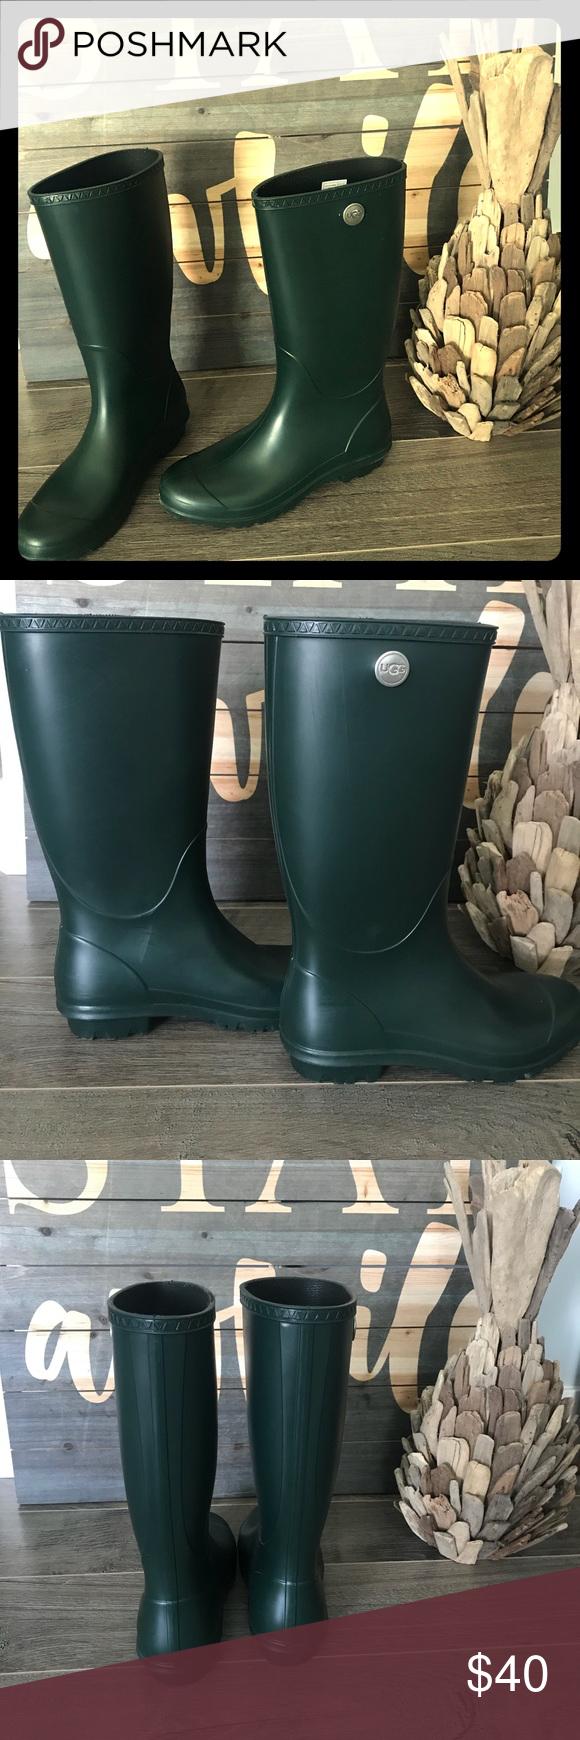 c3f82ad12b9b UGG OLIVE SHELBY MATTE RAIN BOOTS + FreeGift🤩EUC A classic with matte  finish